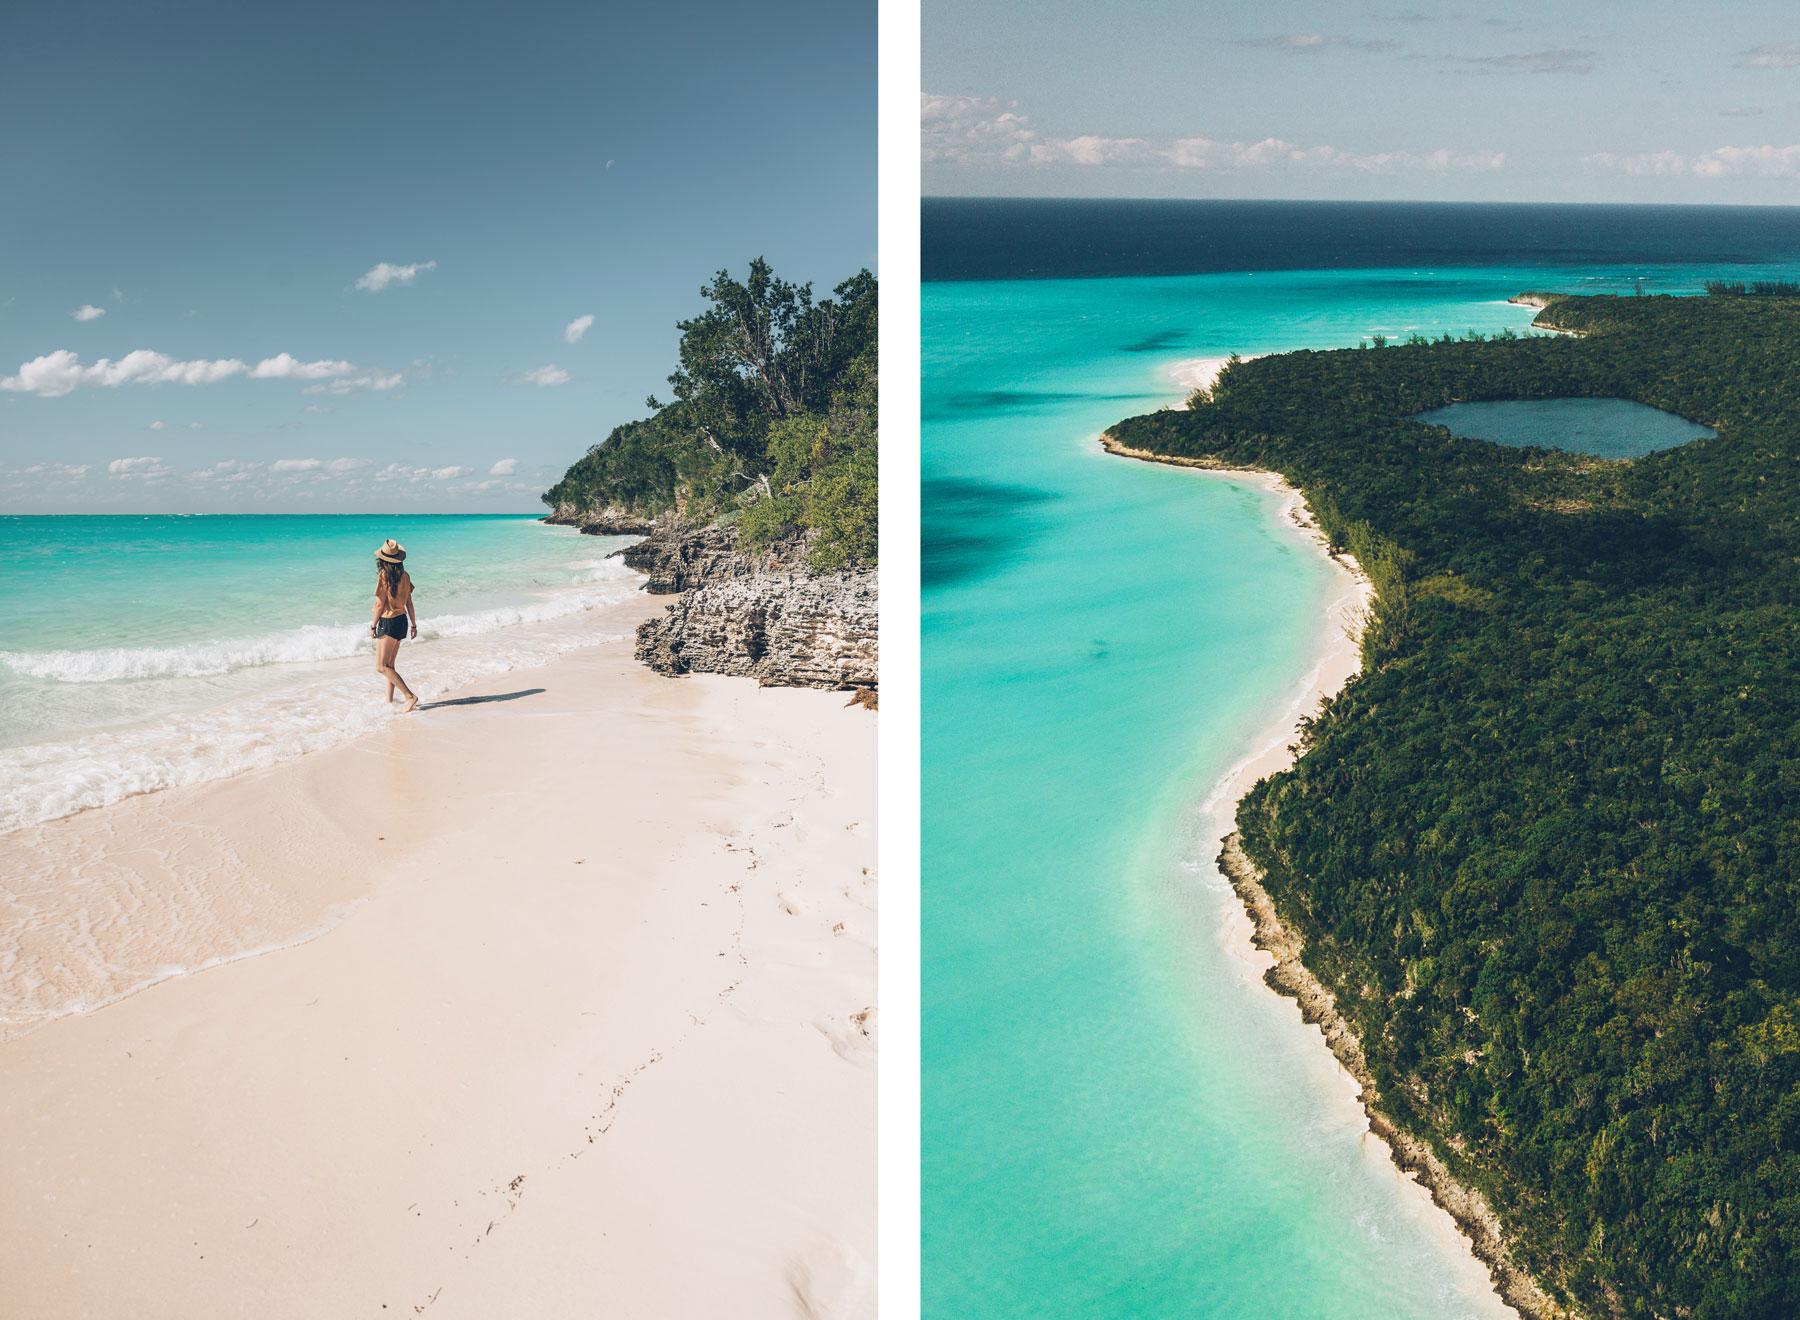 Plage Shanna's Cove, Cat Island, Bahamas